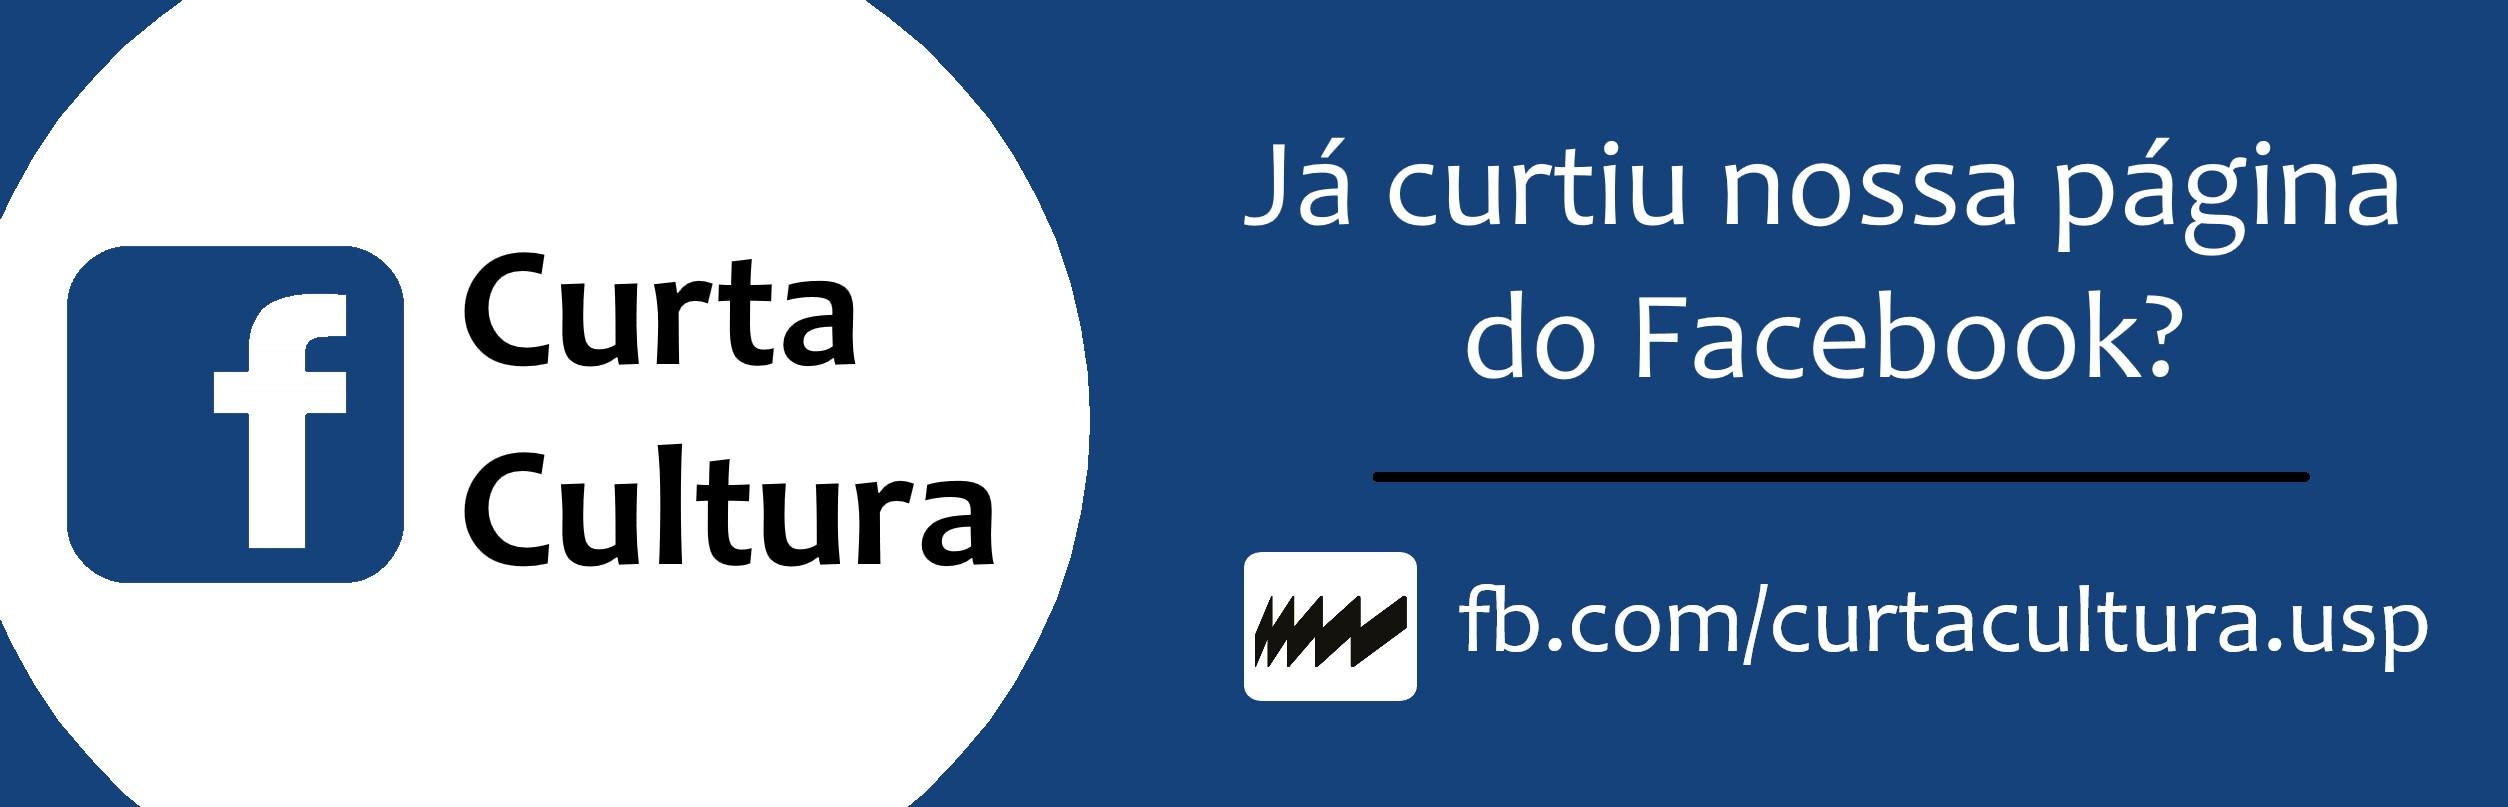 O Portal da Cultura está no Facebook!